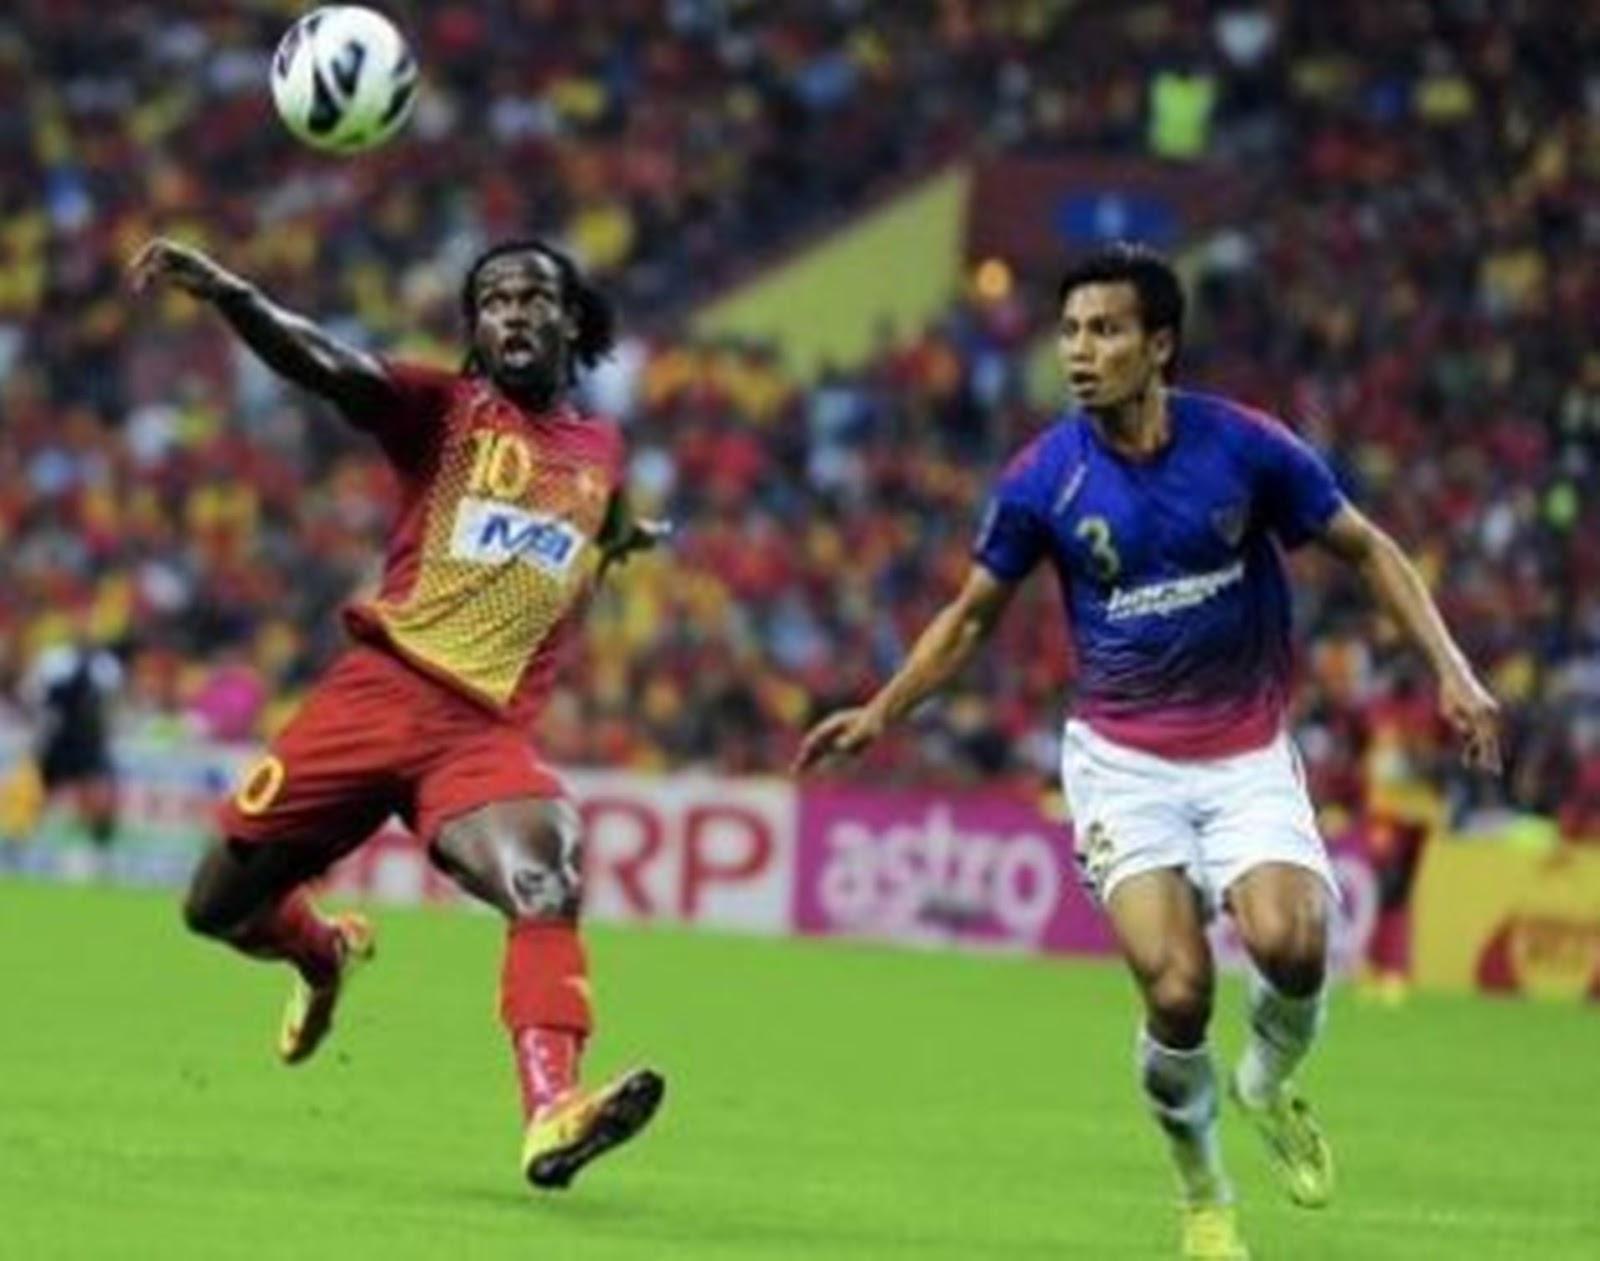 http://1.bp.blogspot.com/-8Wakk7KuCBY/UWPAaPnjY_I/AAAAAAAAAkY/-aqPgJj277k/s1600/Selangor+vs+Johor+Darul+Takzim.jpg